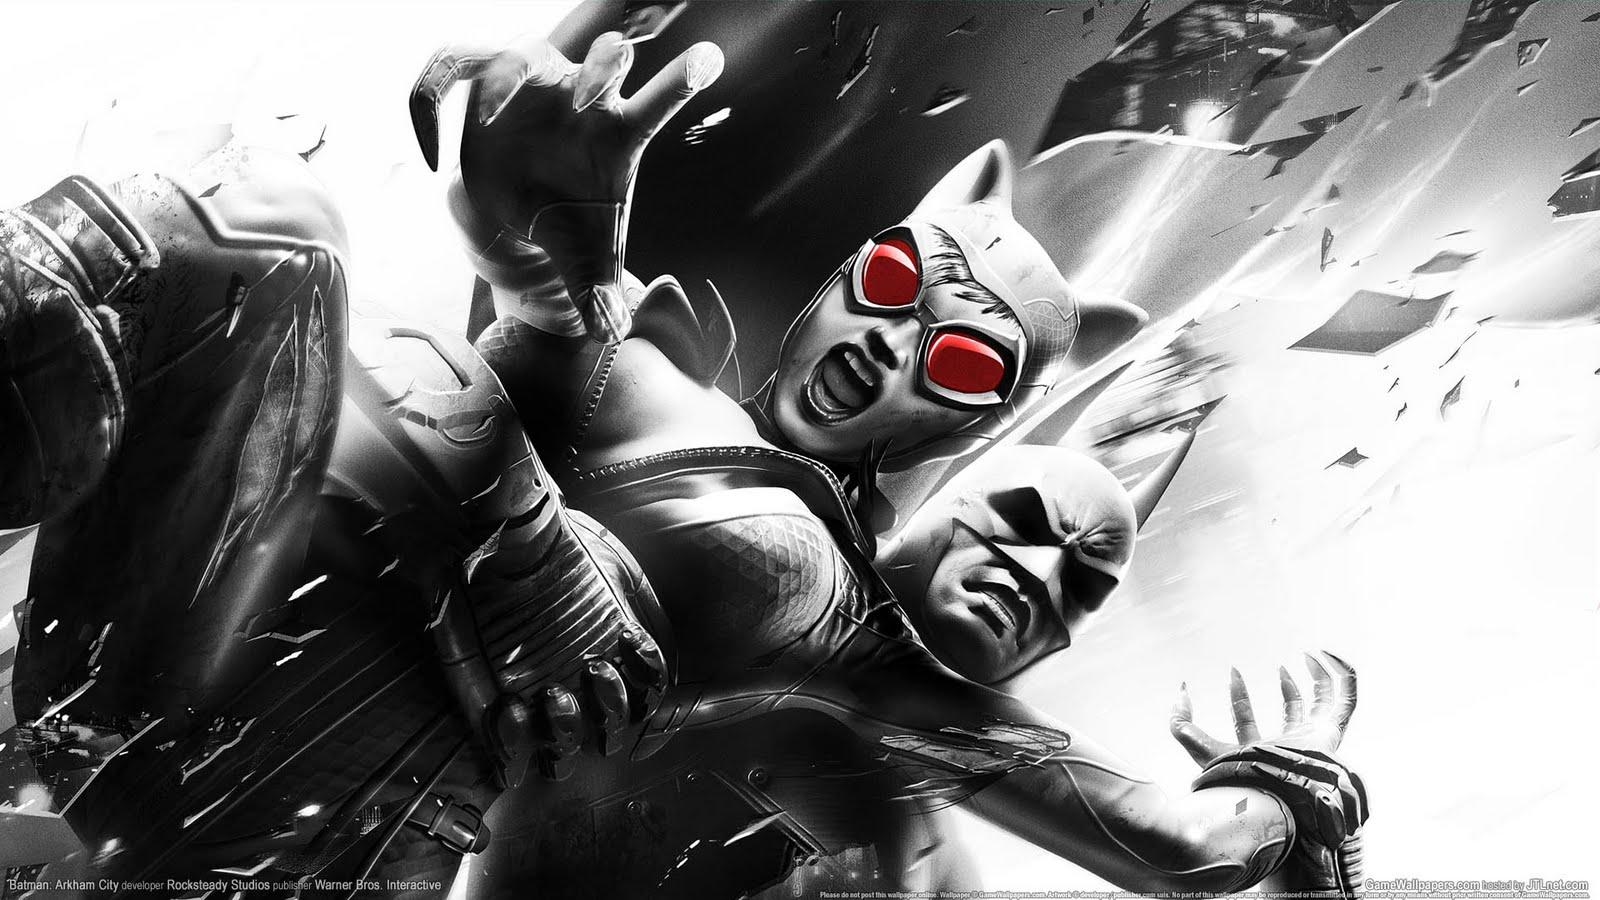 Pcgames Bolivia Batman Arkham City se estrena en PC con problemas en 1600x900